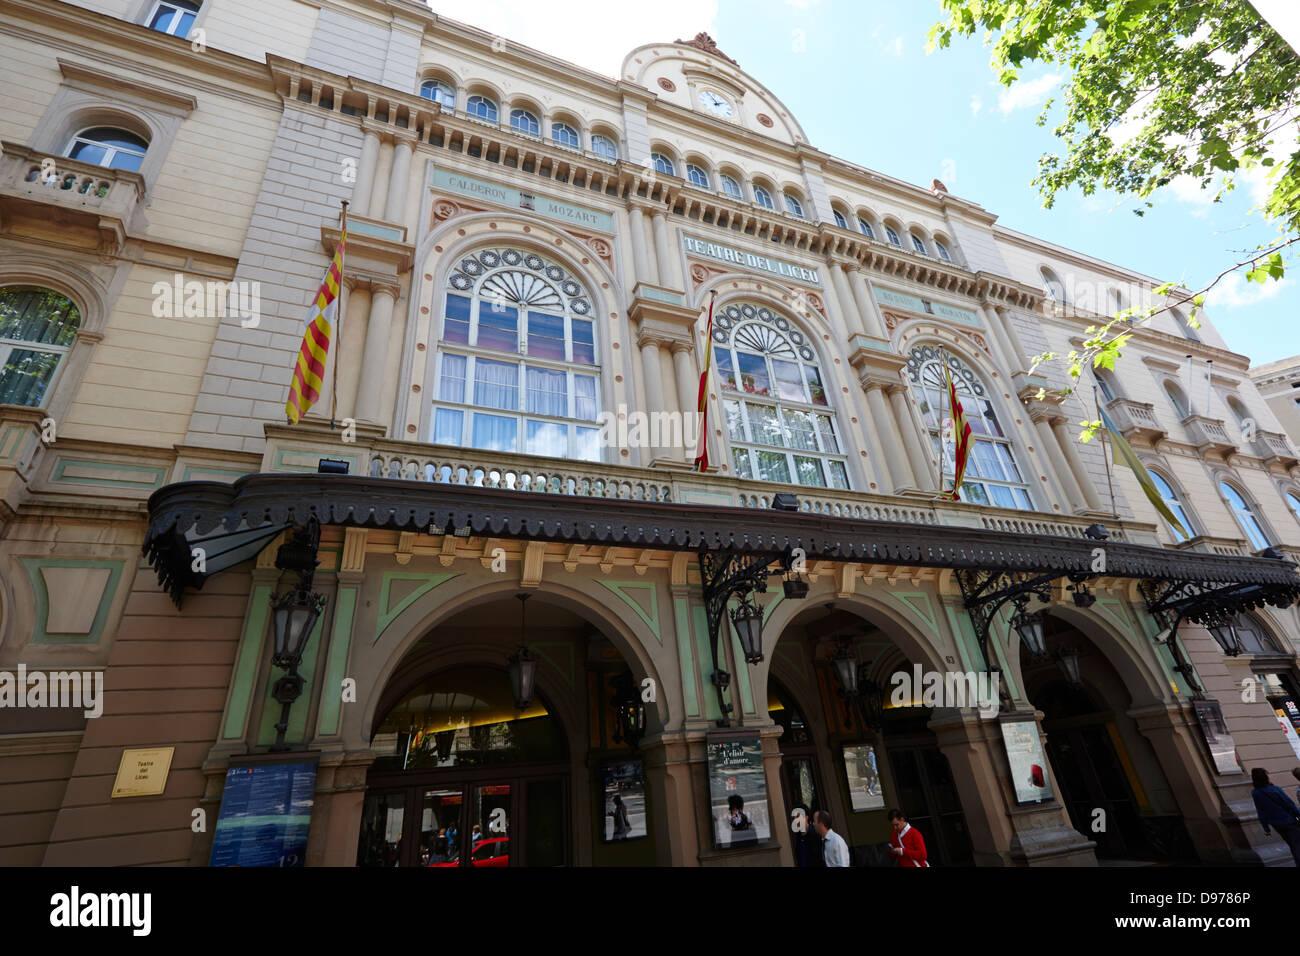 gran teatre del liceu la rambla barcelona catalonia spain - Stock Image